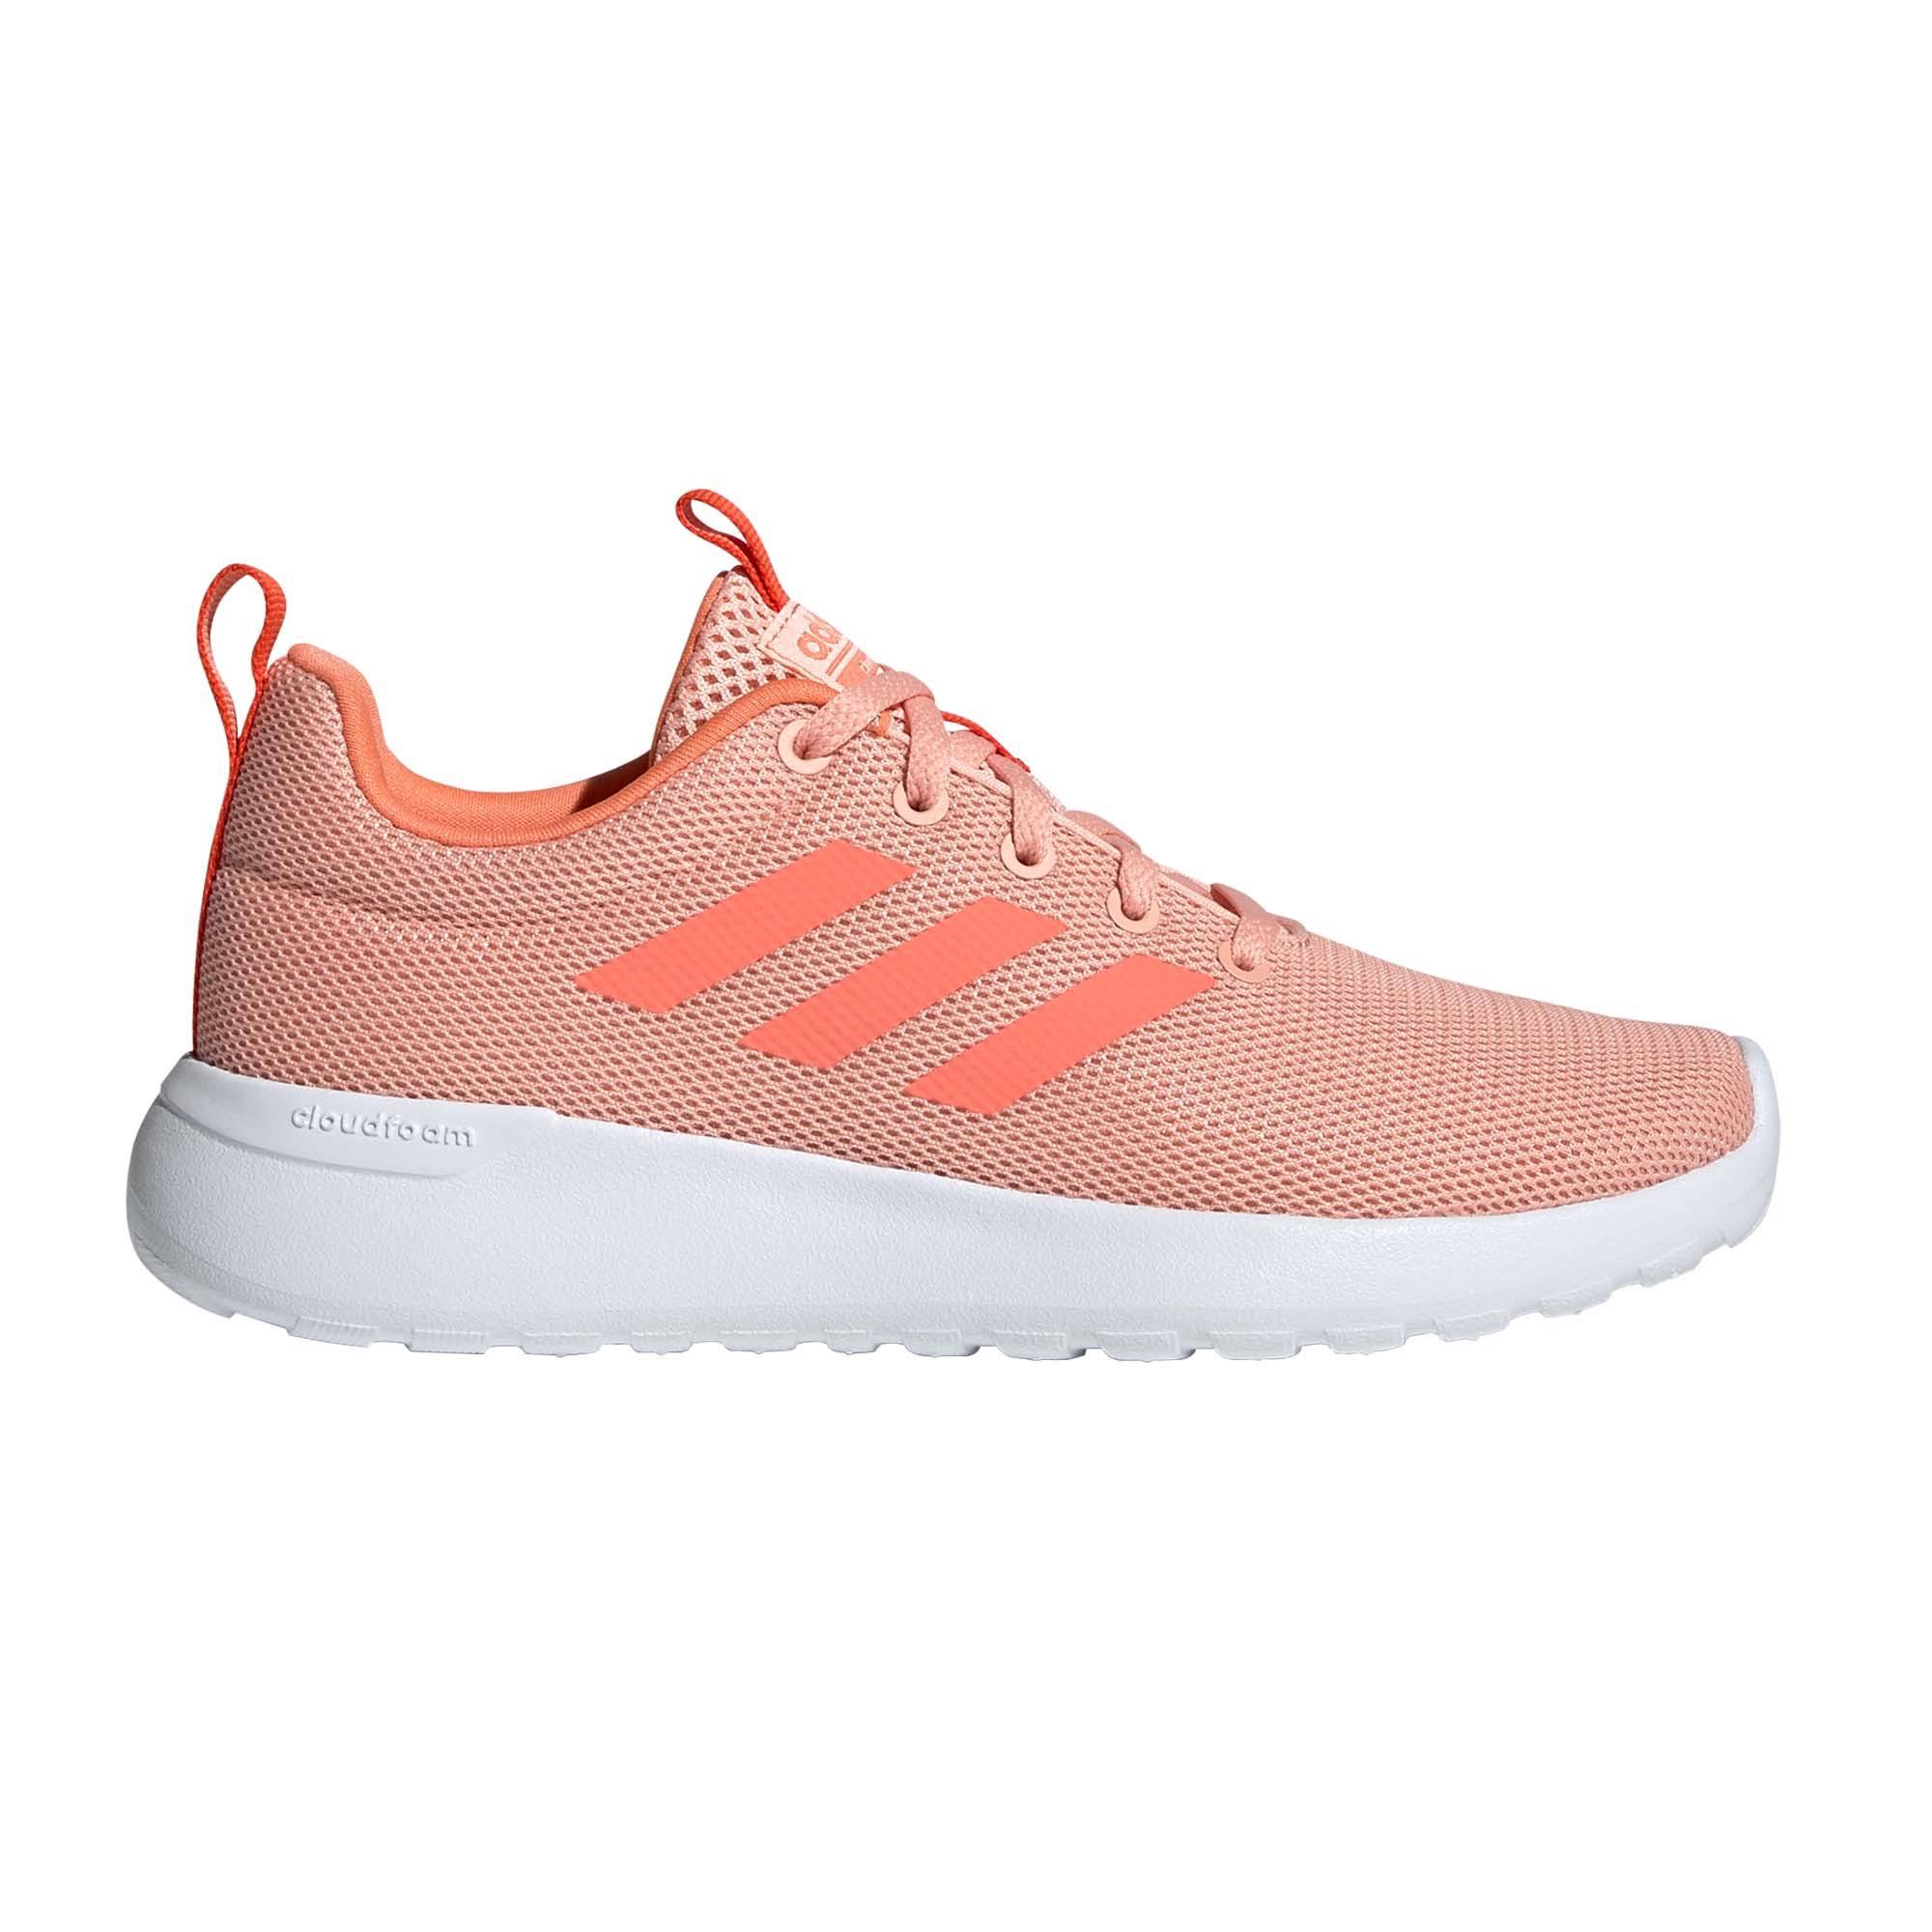 Adidas Lite Racer CLN Girls Trainer Pink - UK 11